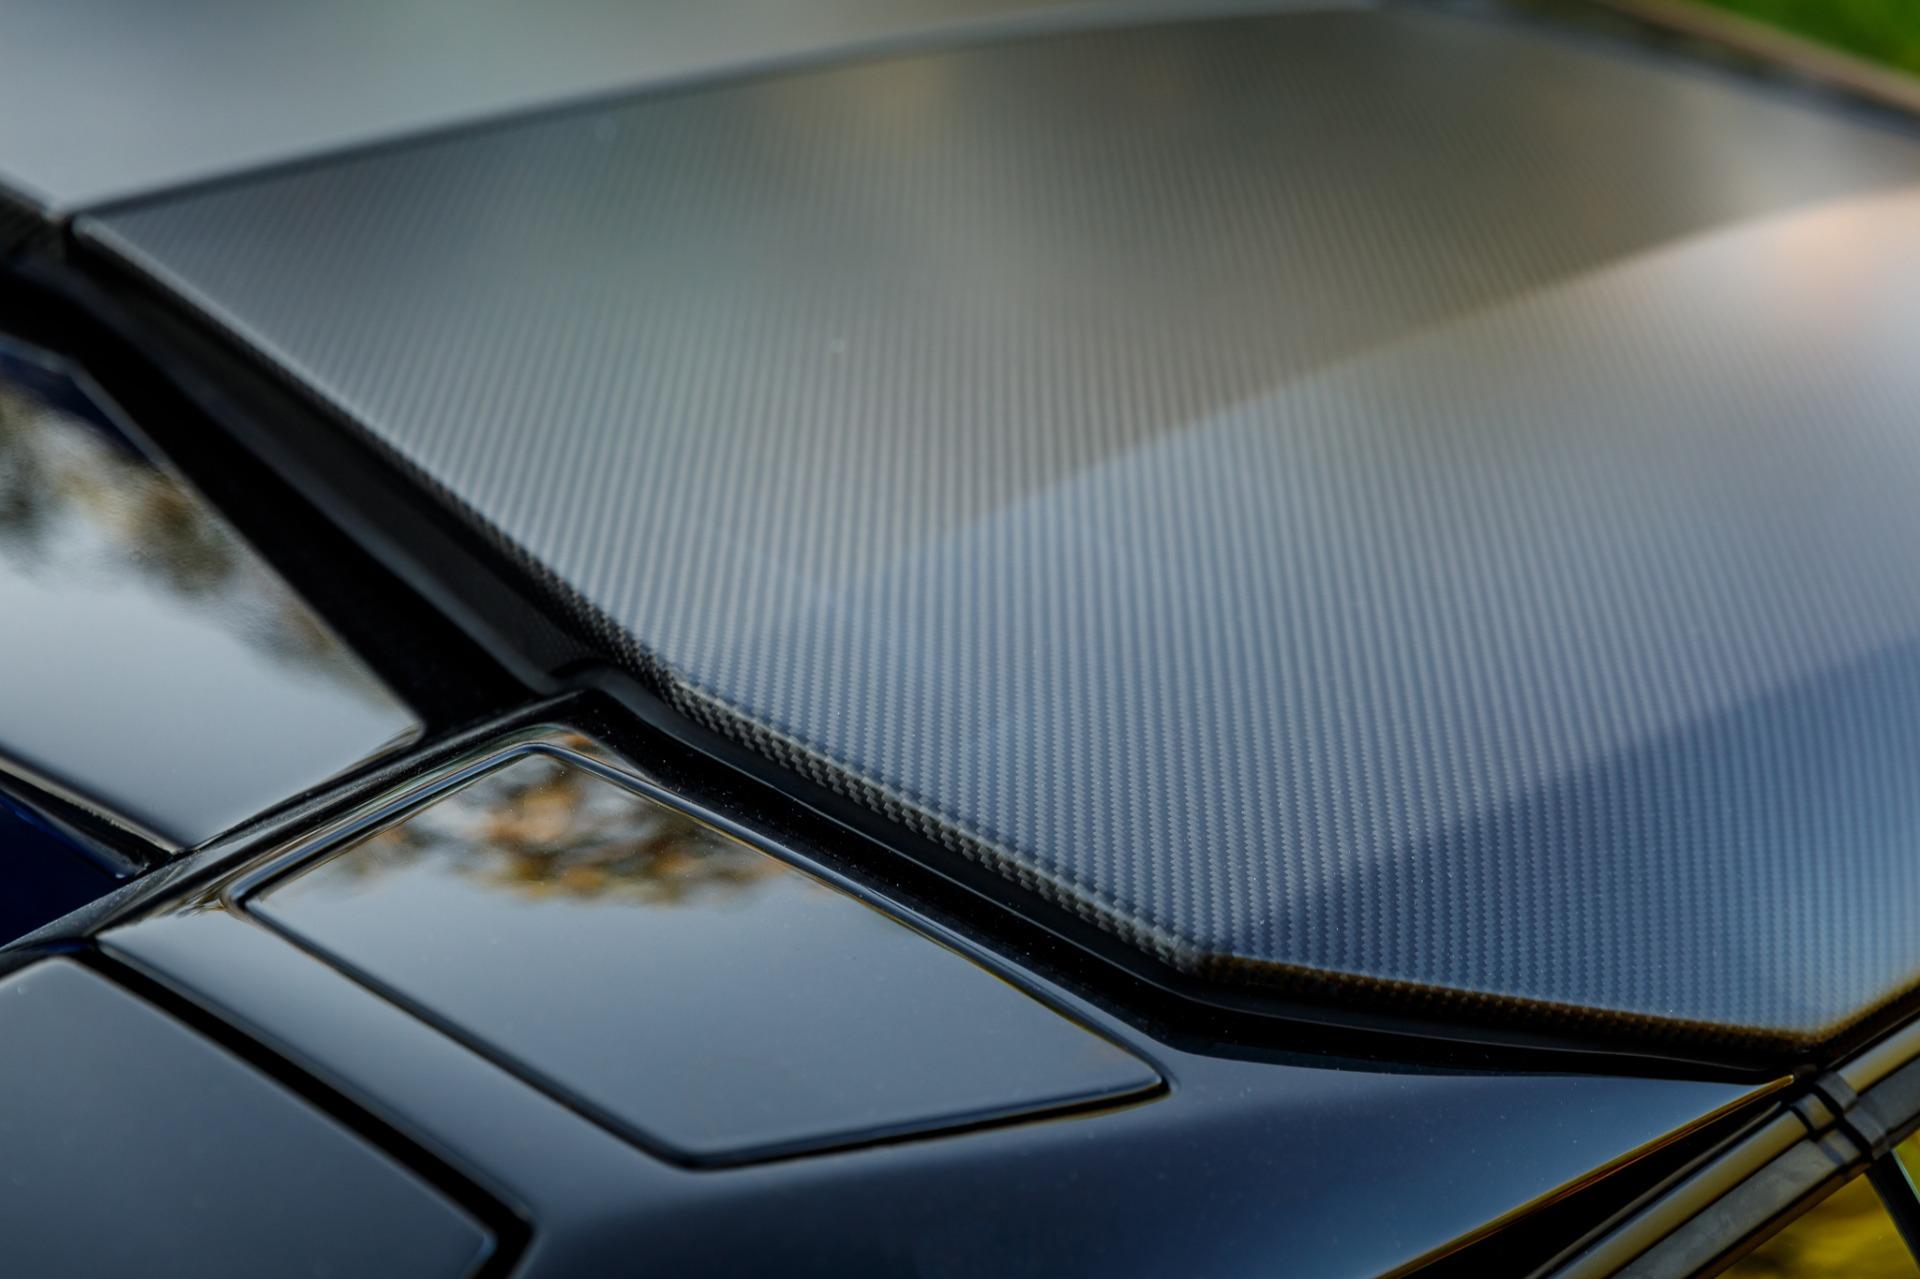 Used 2017 Lamborghini Aventador LP 750-4 SV / 740HP / AWD / 1930 MI / NAV / CAMERA for sale Sold at Formula Imports in Charlotte NC 28227 80